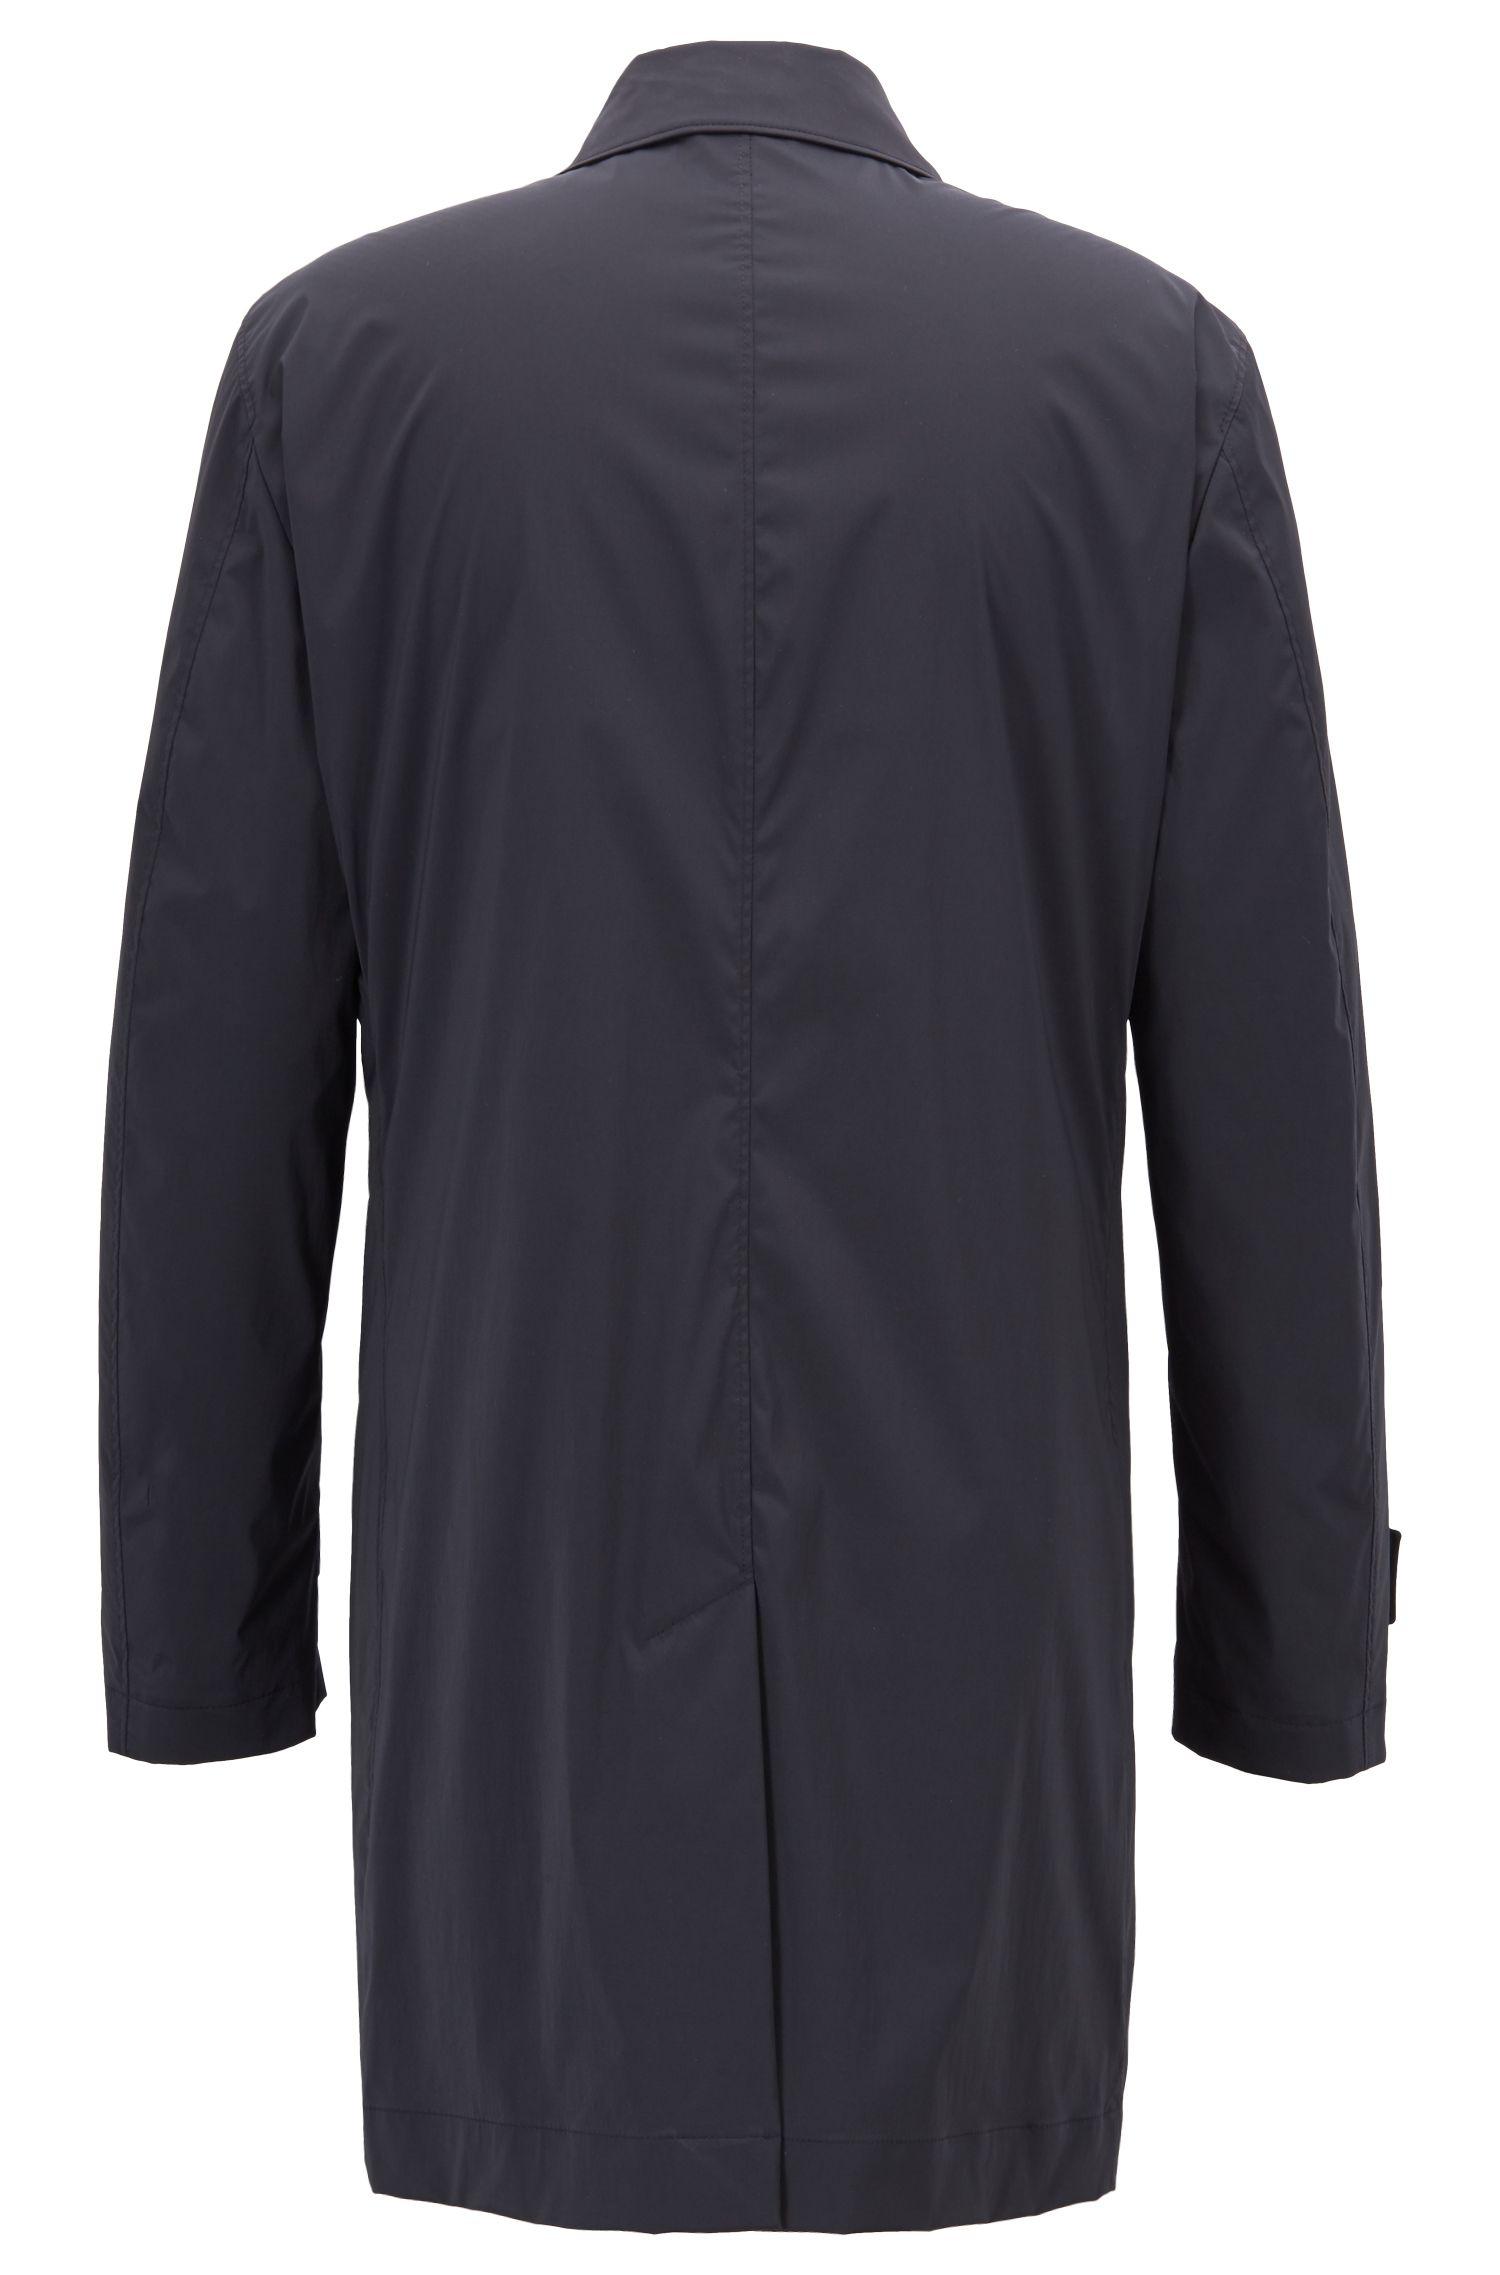 Long-length car coat in stretch fabric, Black